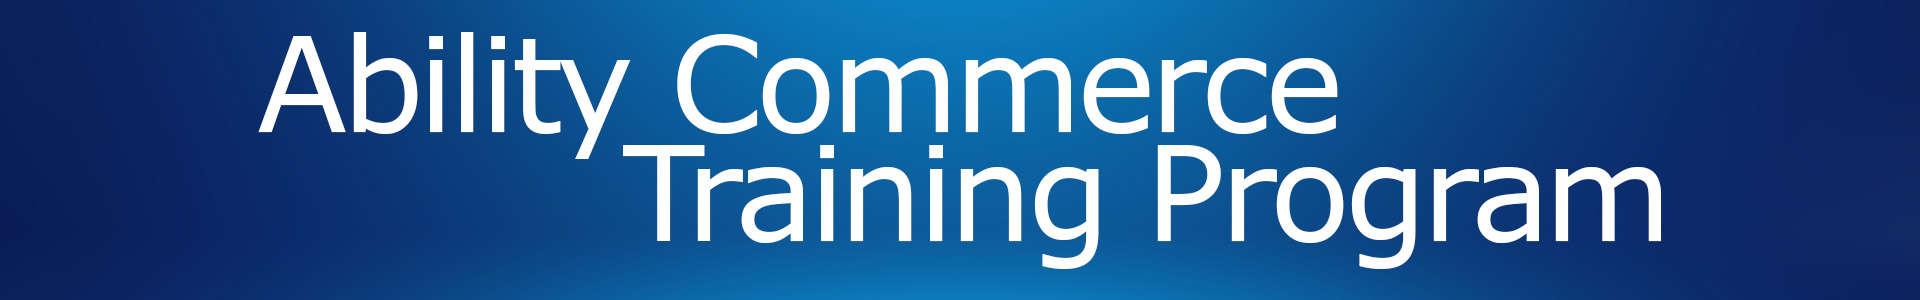 Ability Commerce Training Program